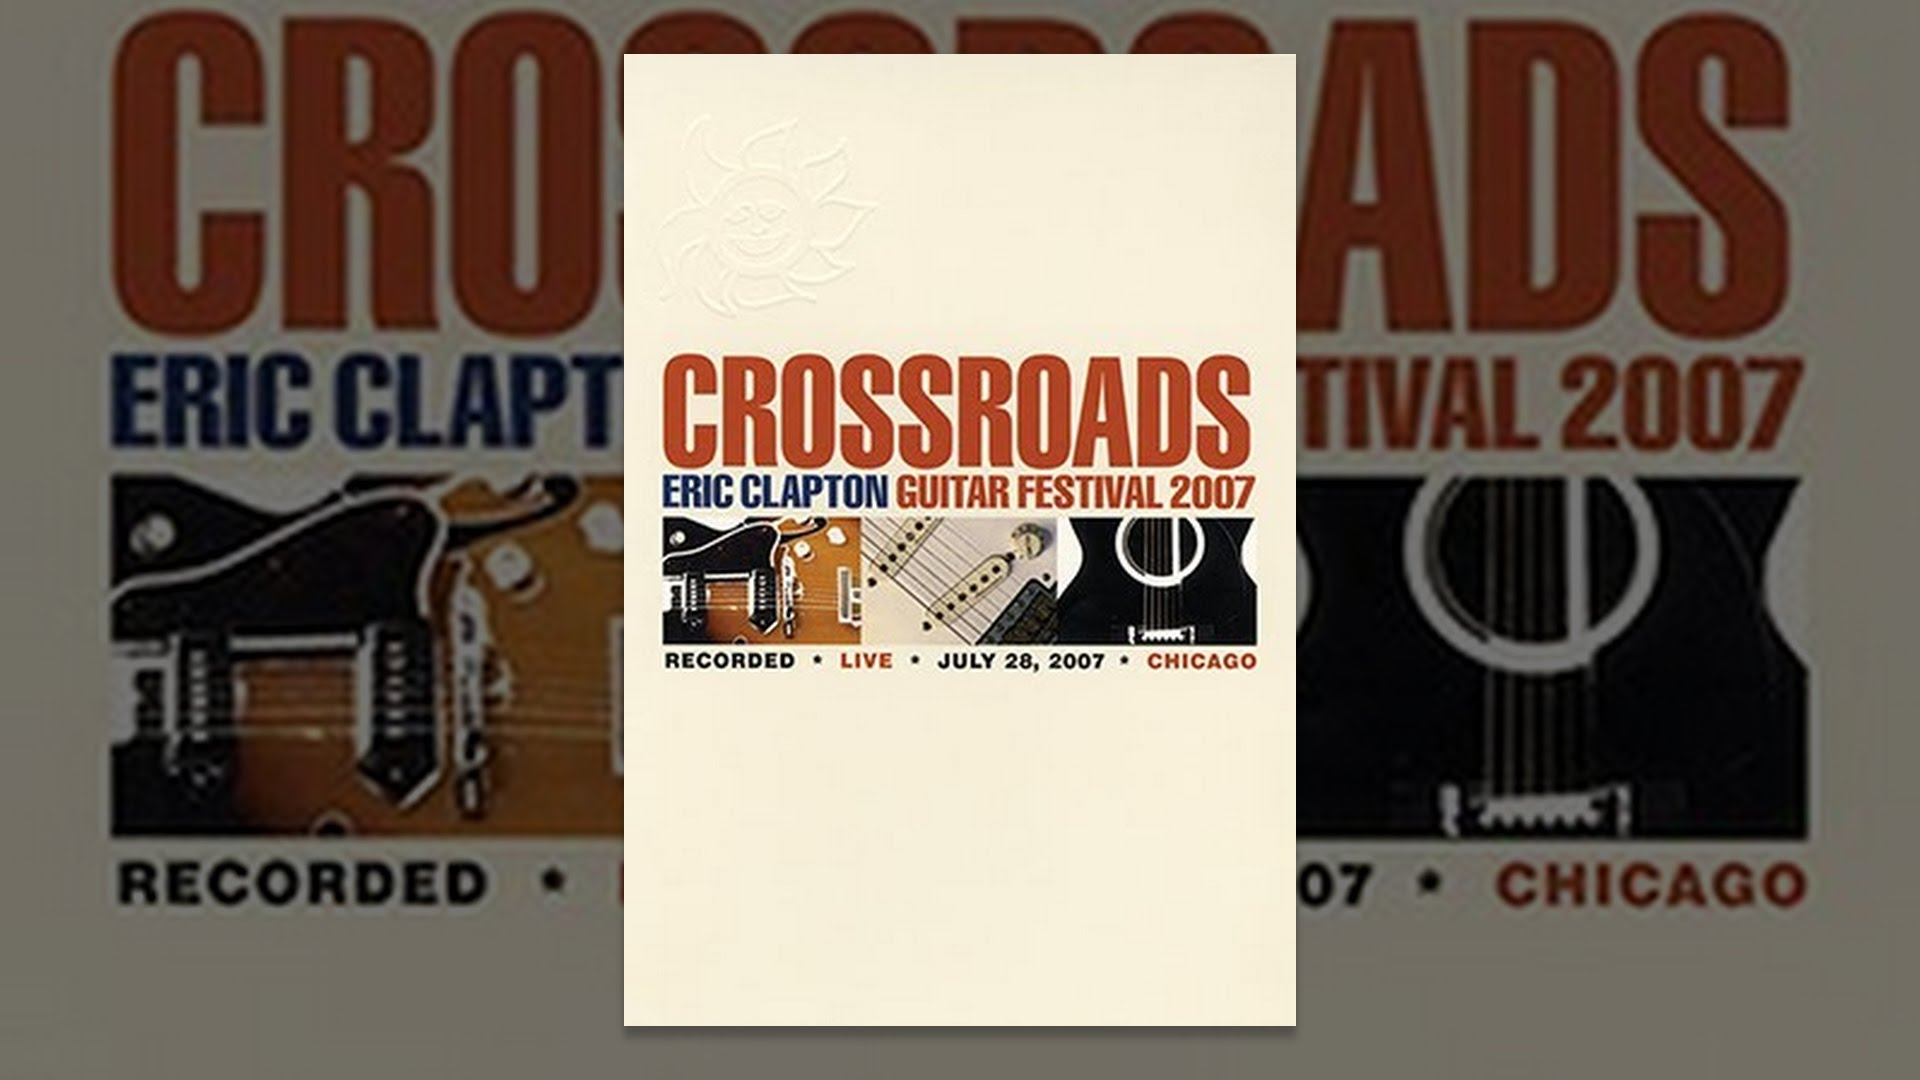 eric clapton crossroads guitar festival 2007 youtube. Black Bedroom Furniture Sets. Home Design Ideas